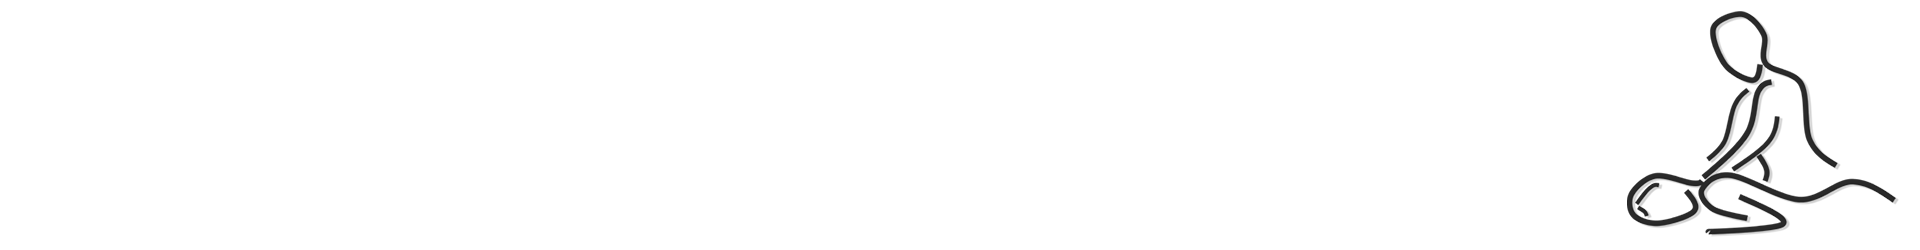 Massagepraktijk Relax Boskoop logo